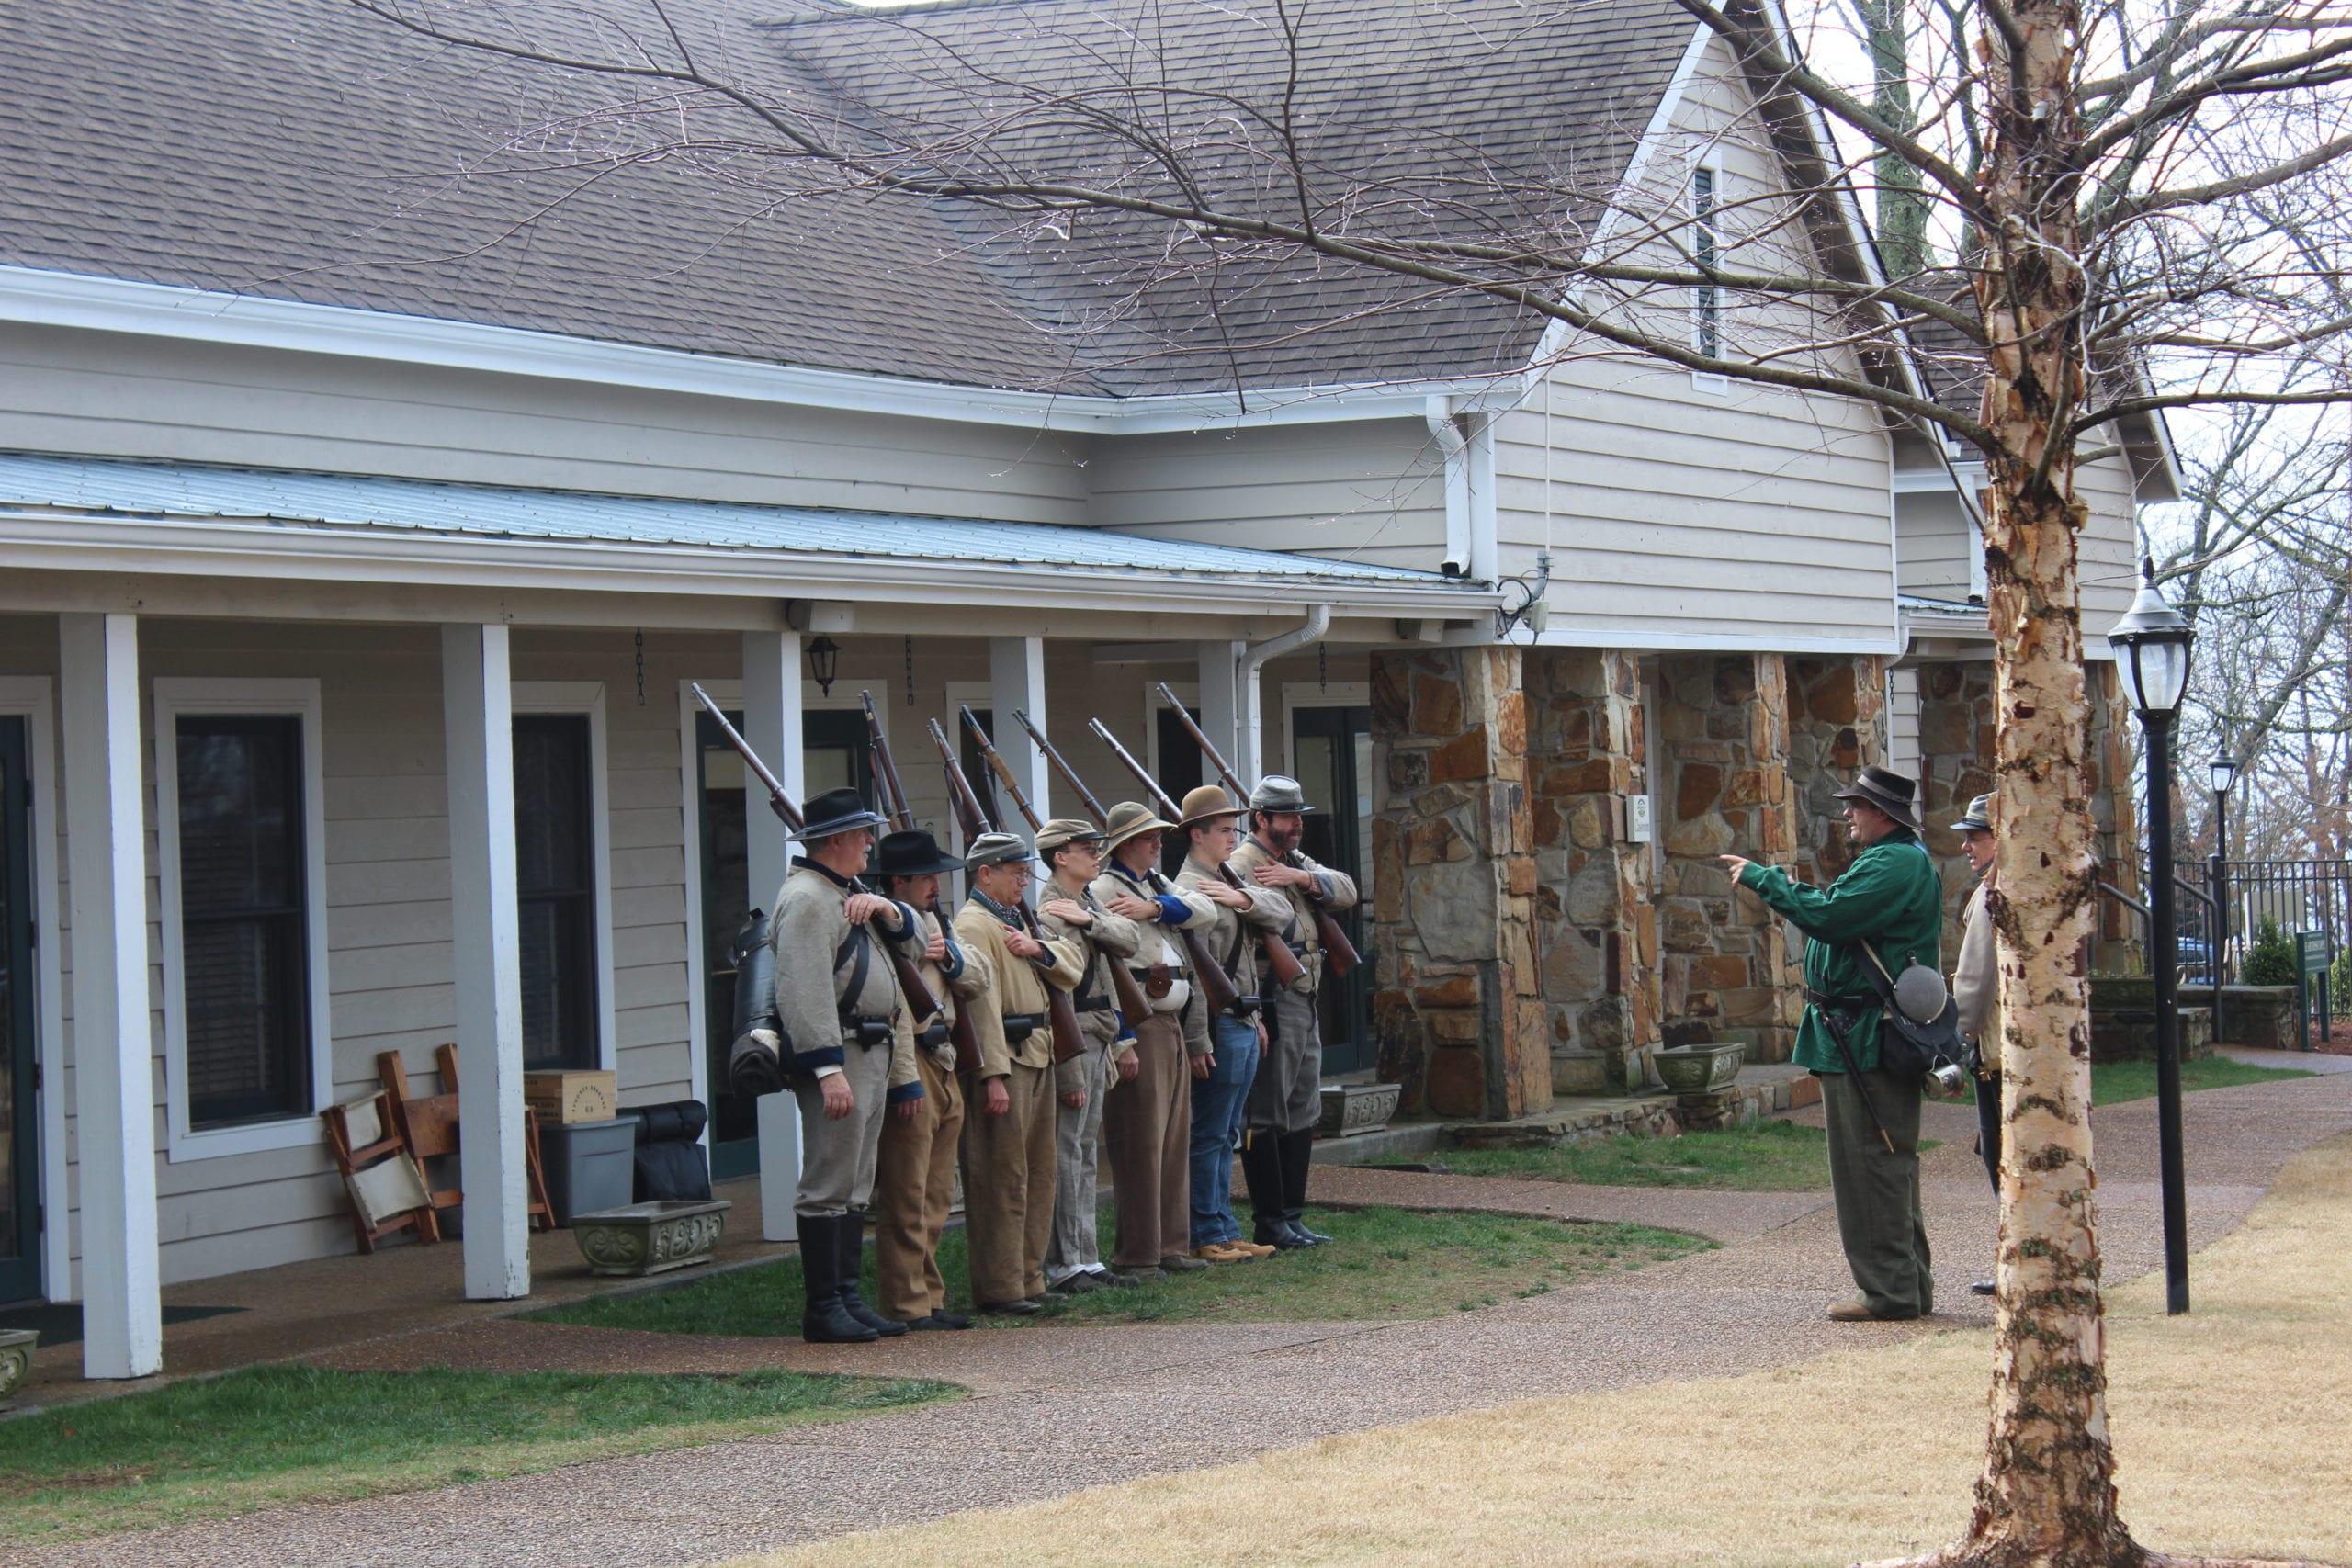 Burritt Home School: The Civil War